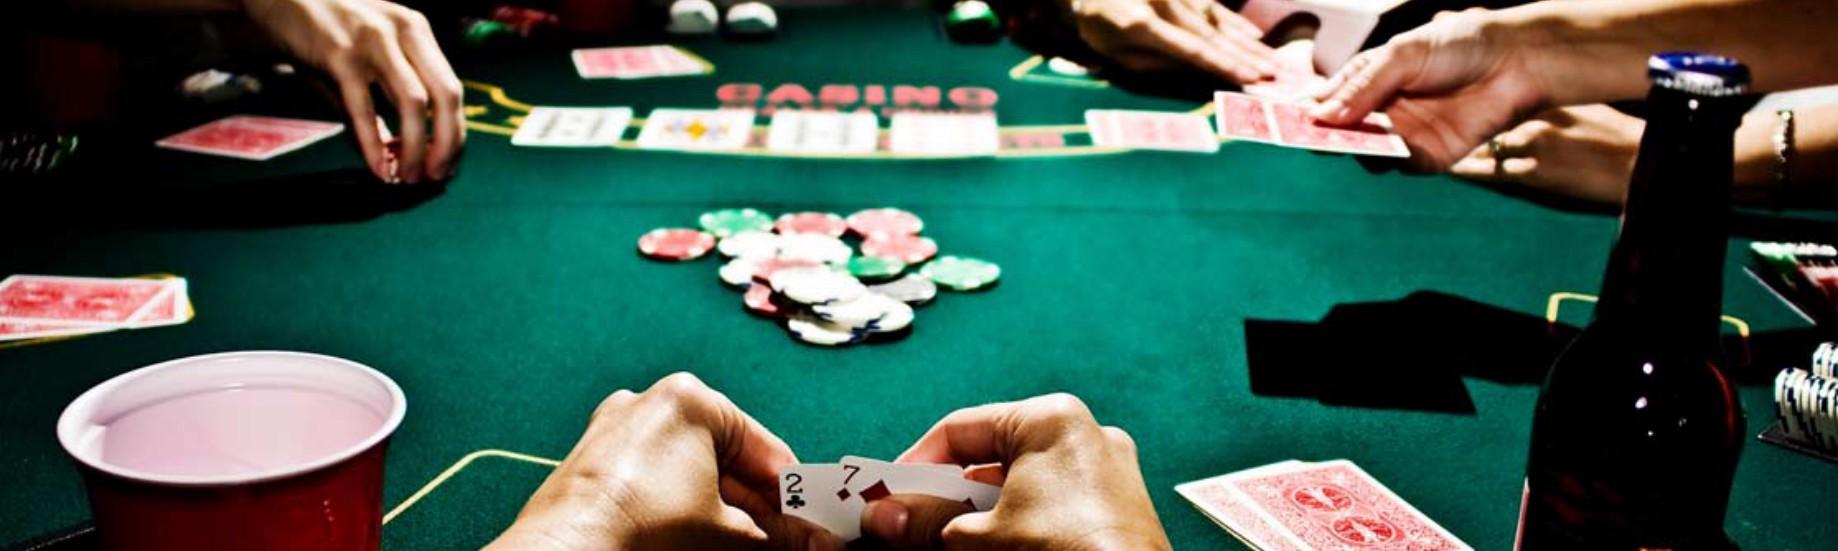 Judi Online Poker: Pro Vs Cons